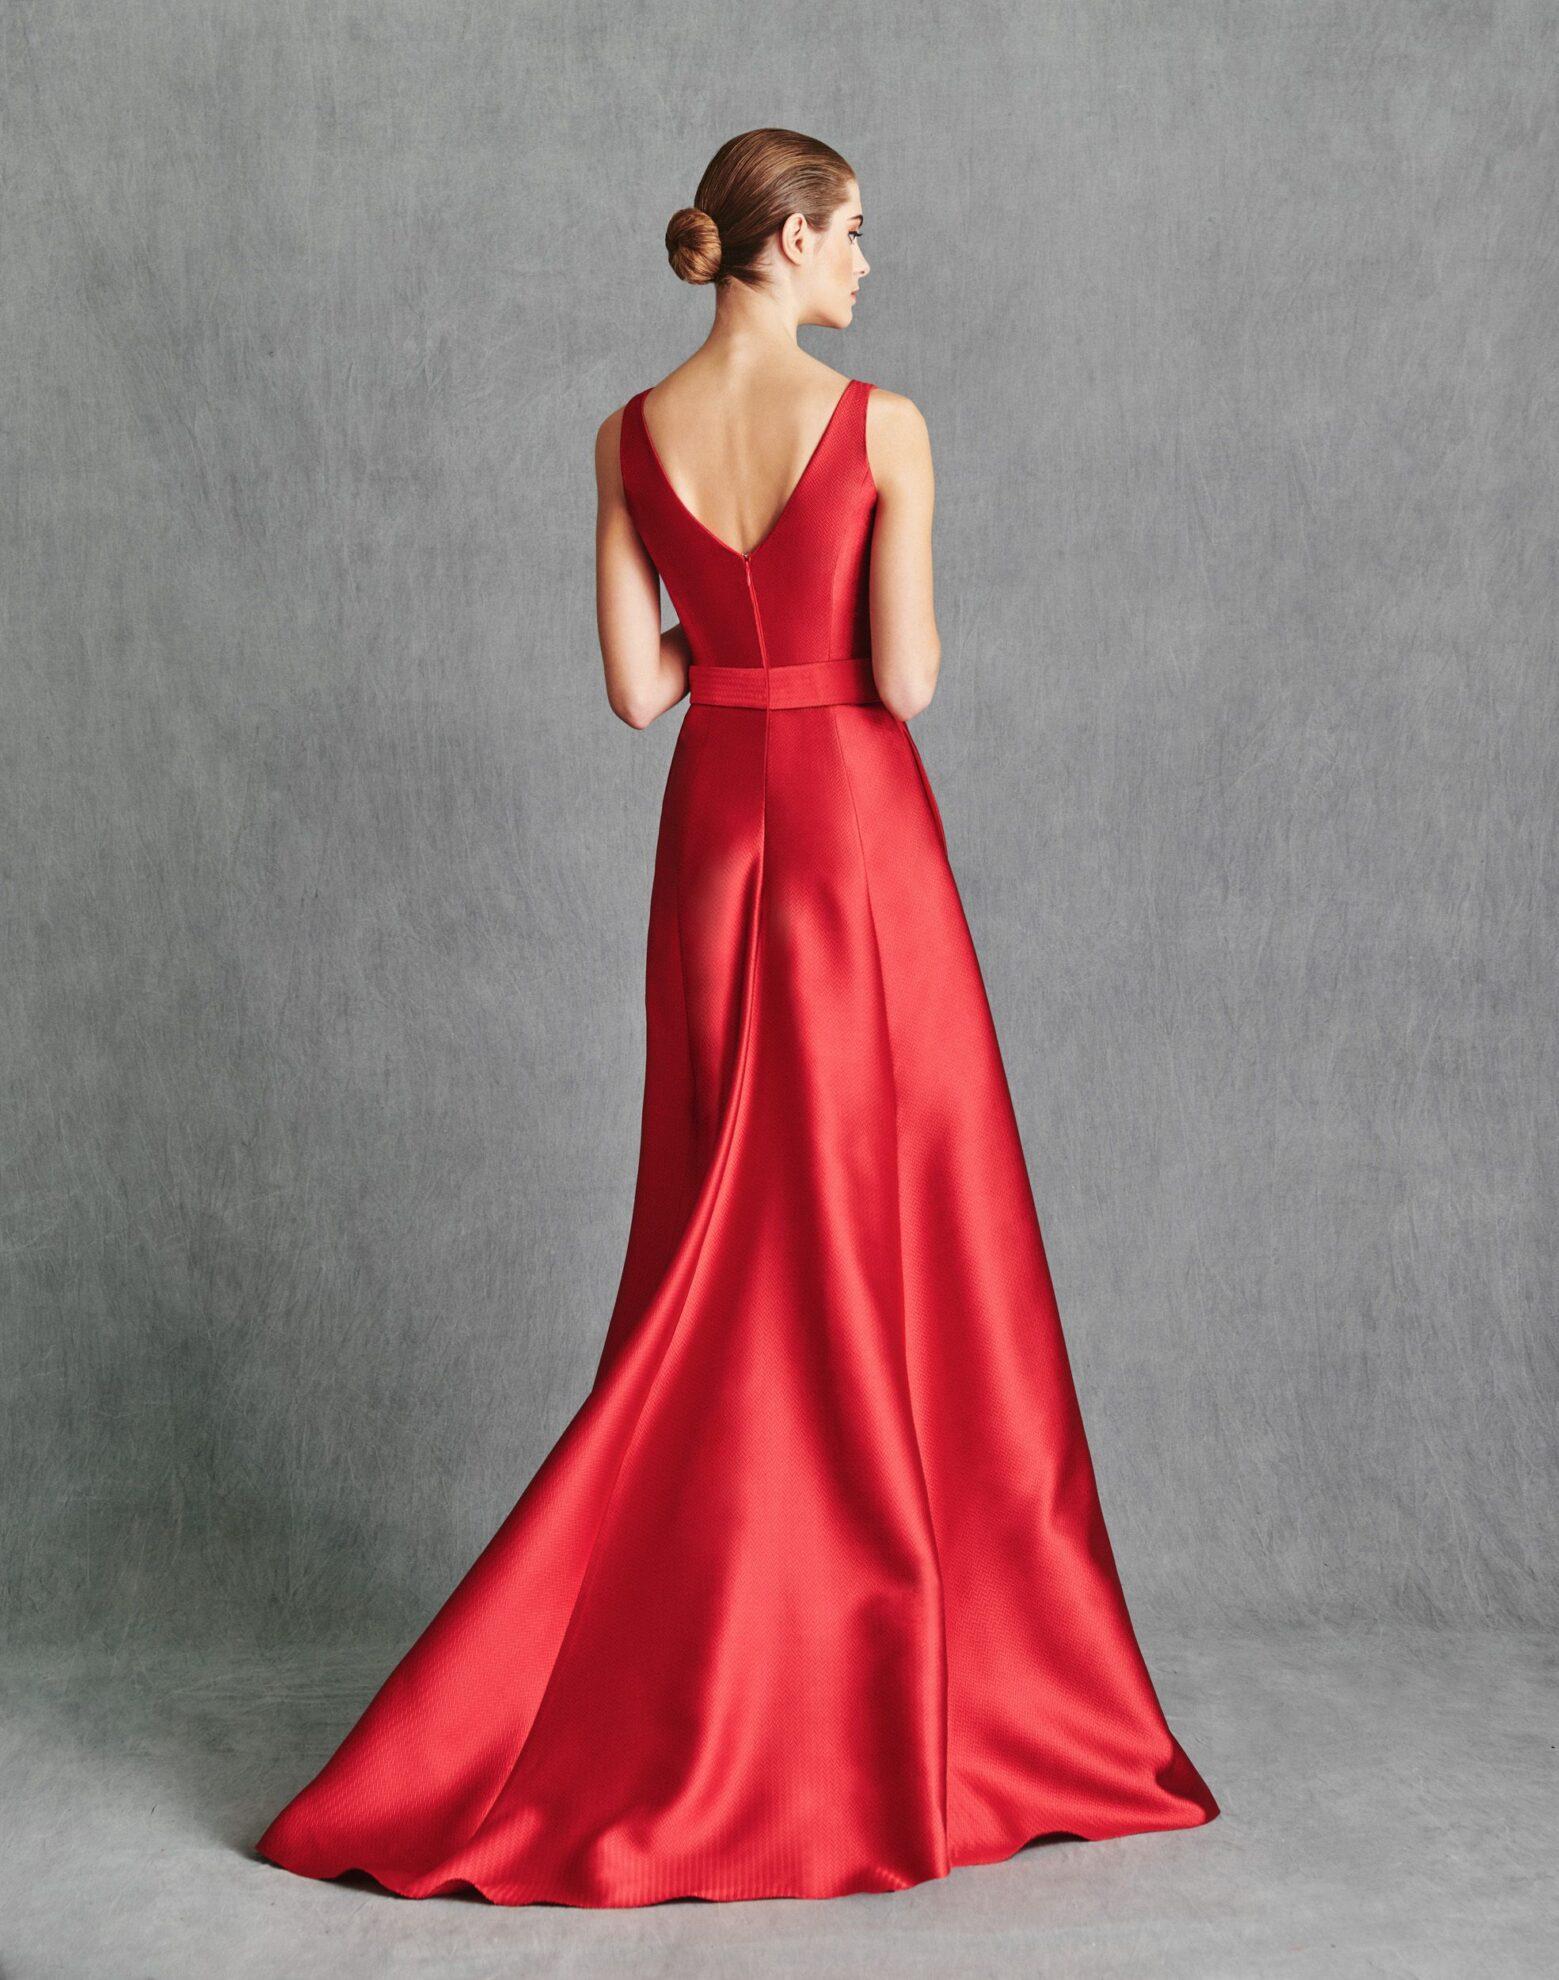 Vestidos de Fiesta 2020 - Silvia Fernandez Atelier - ILLINOIS - detrás